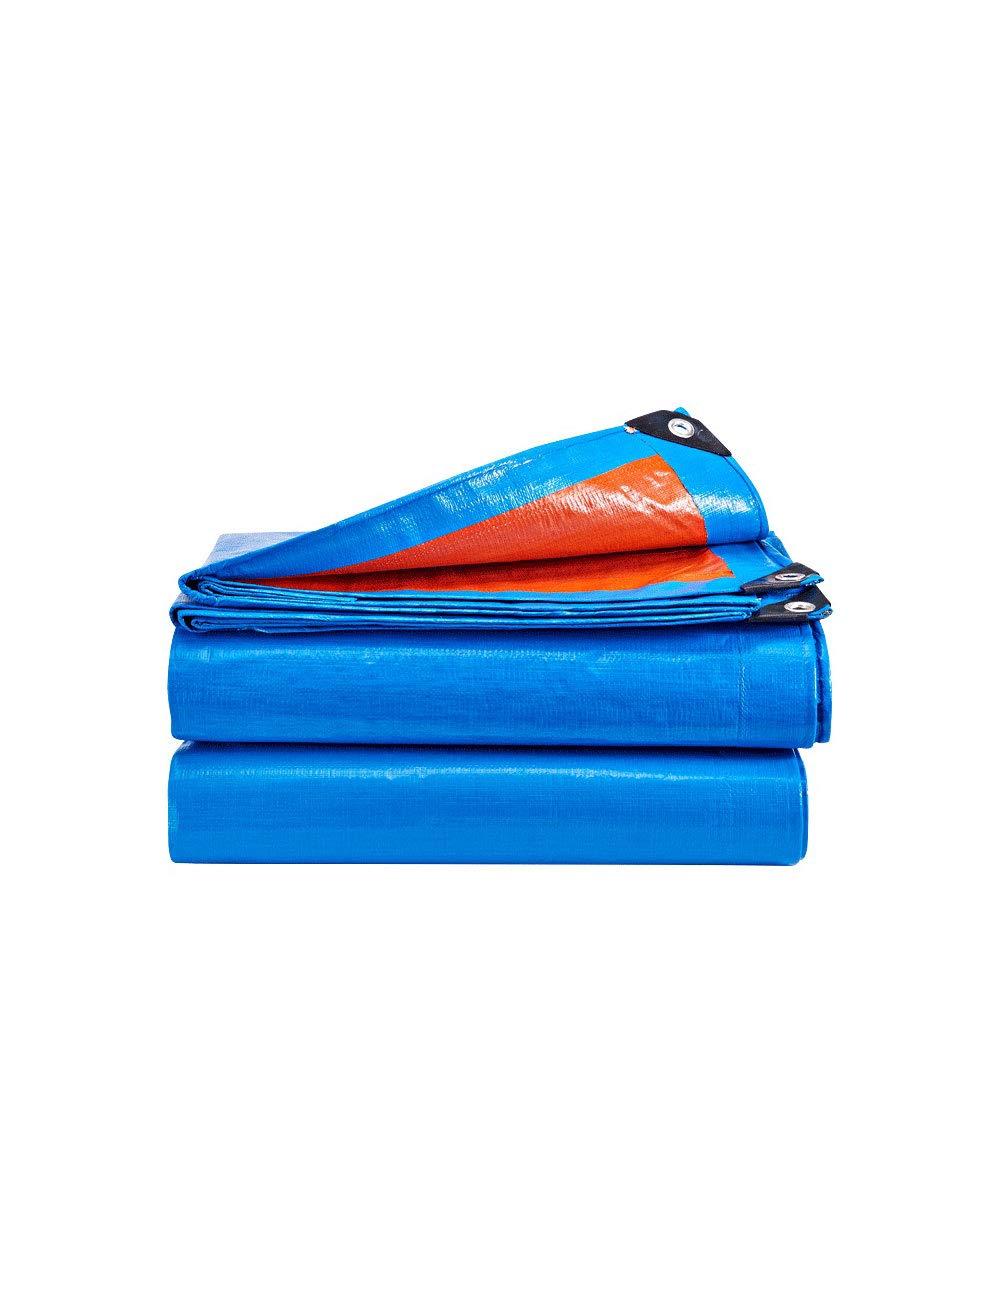 DLyng 防水キャンバスタープブルーとレッドリバーシブル多目的タープカバースーパーヘビーデューティターフグロメットと強化されたエッジ耐久性、耐紫外線性、車用ターポリン、キャンプテント (Size : 7m*5m) 7m*5m  B07HF43PDS